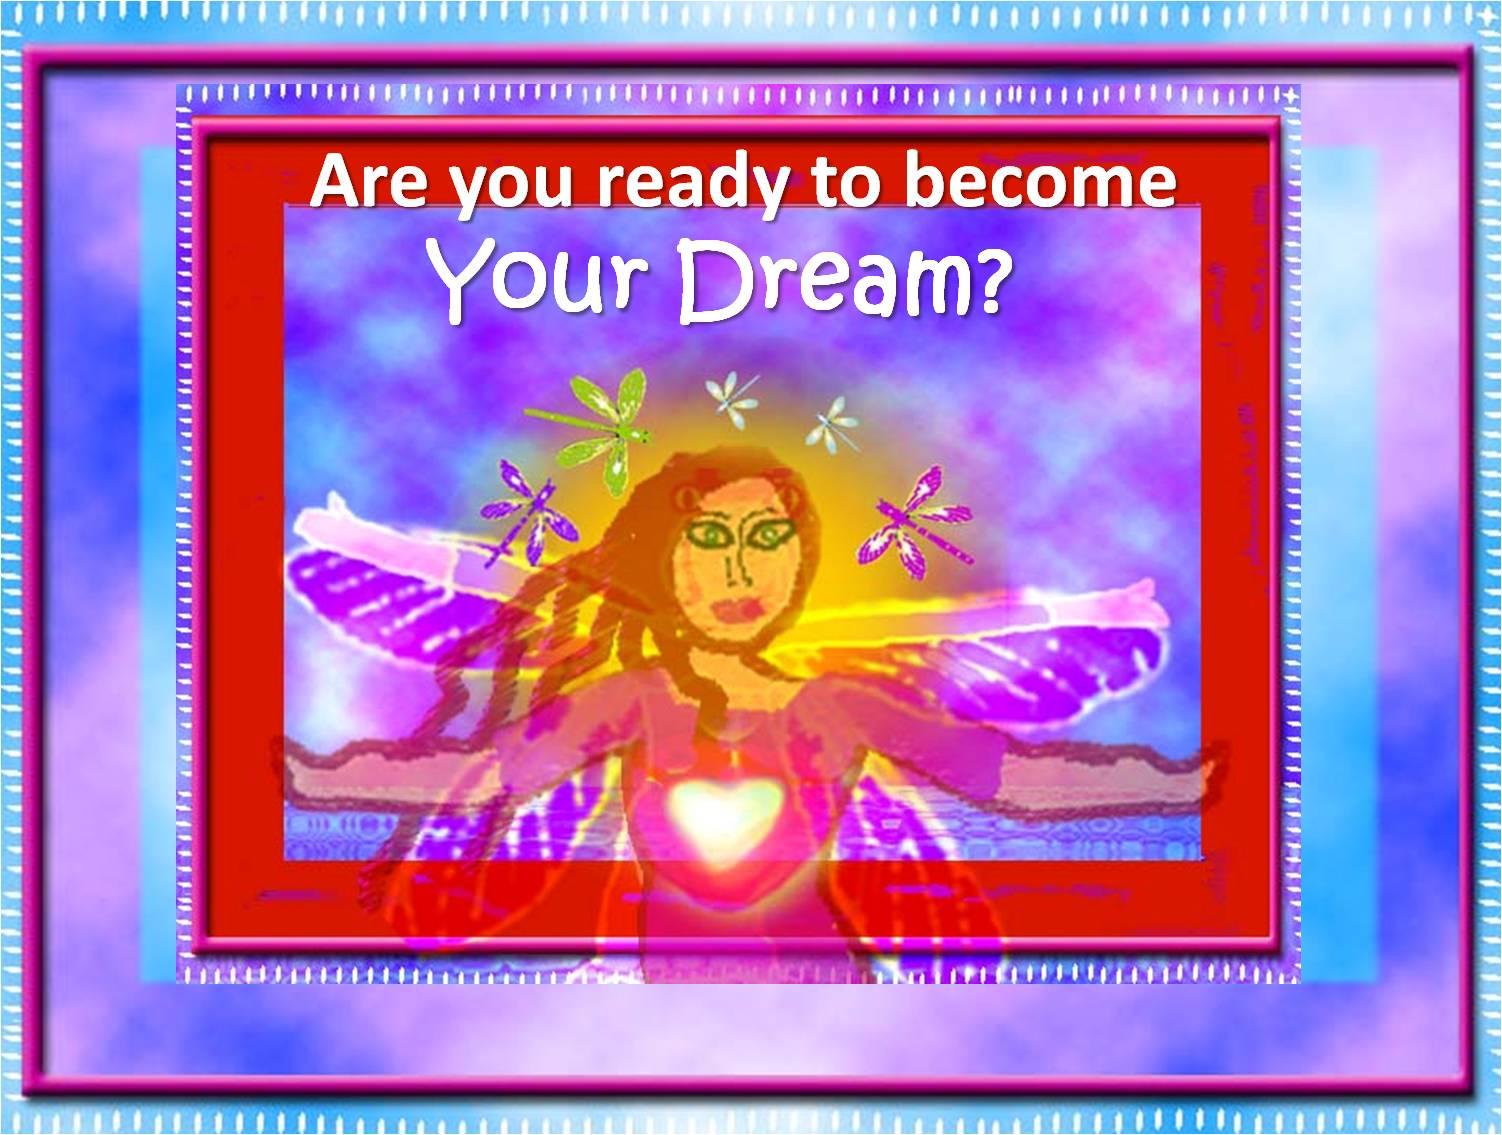 dreamexpress-virtualtourB-slide19-become